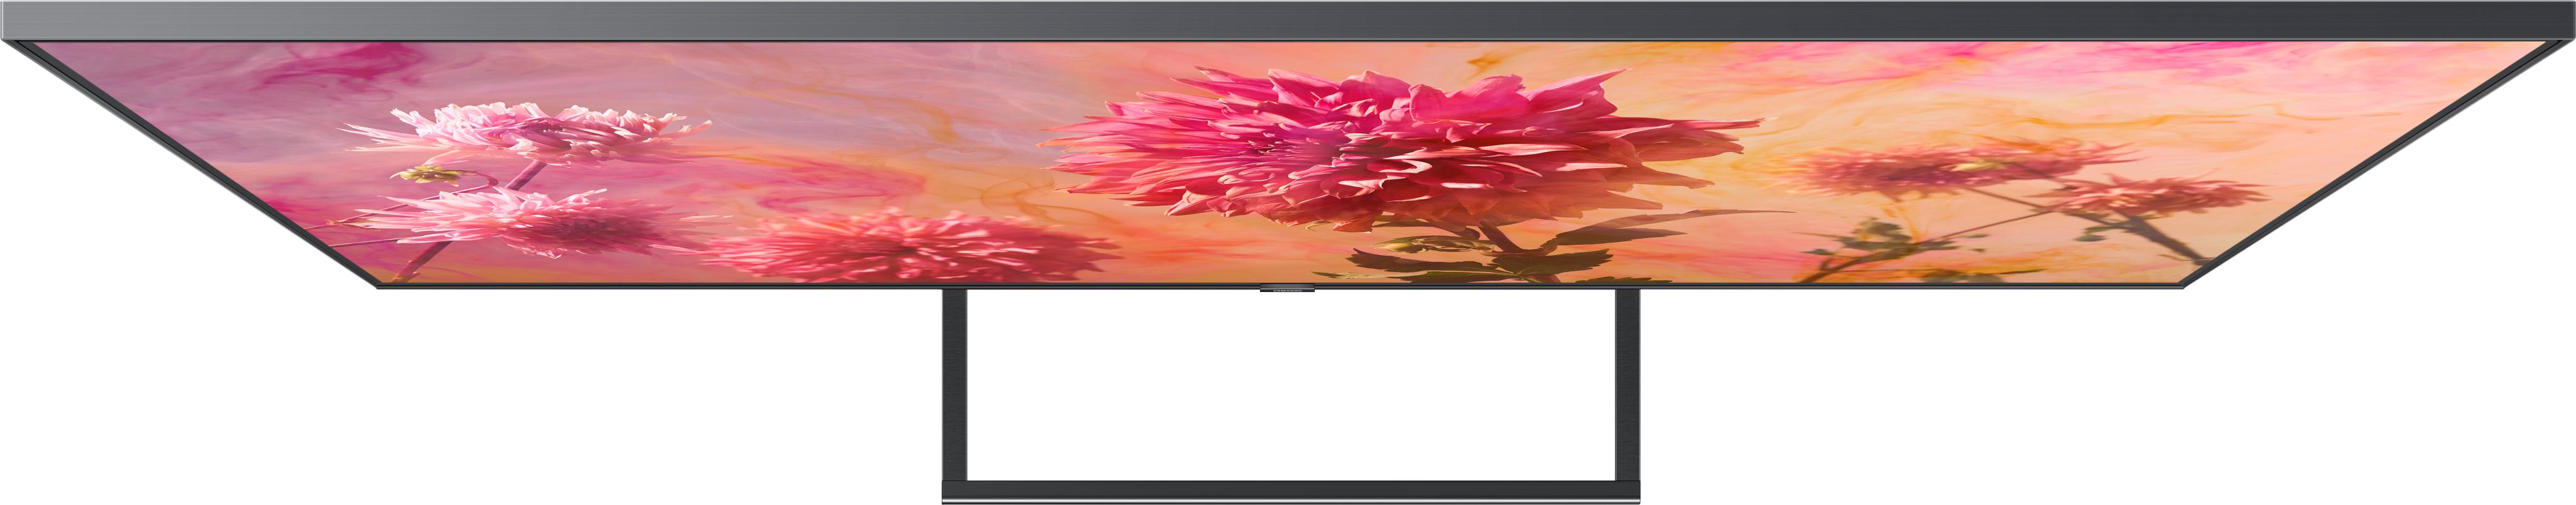 Image 11 for Samsung QN75Q9FNAFXZA